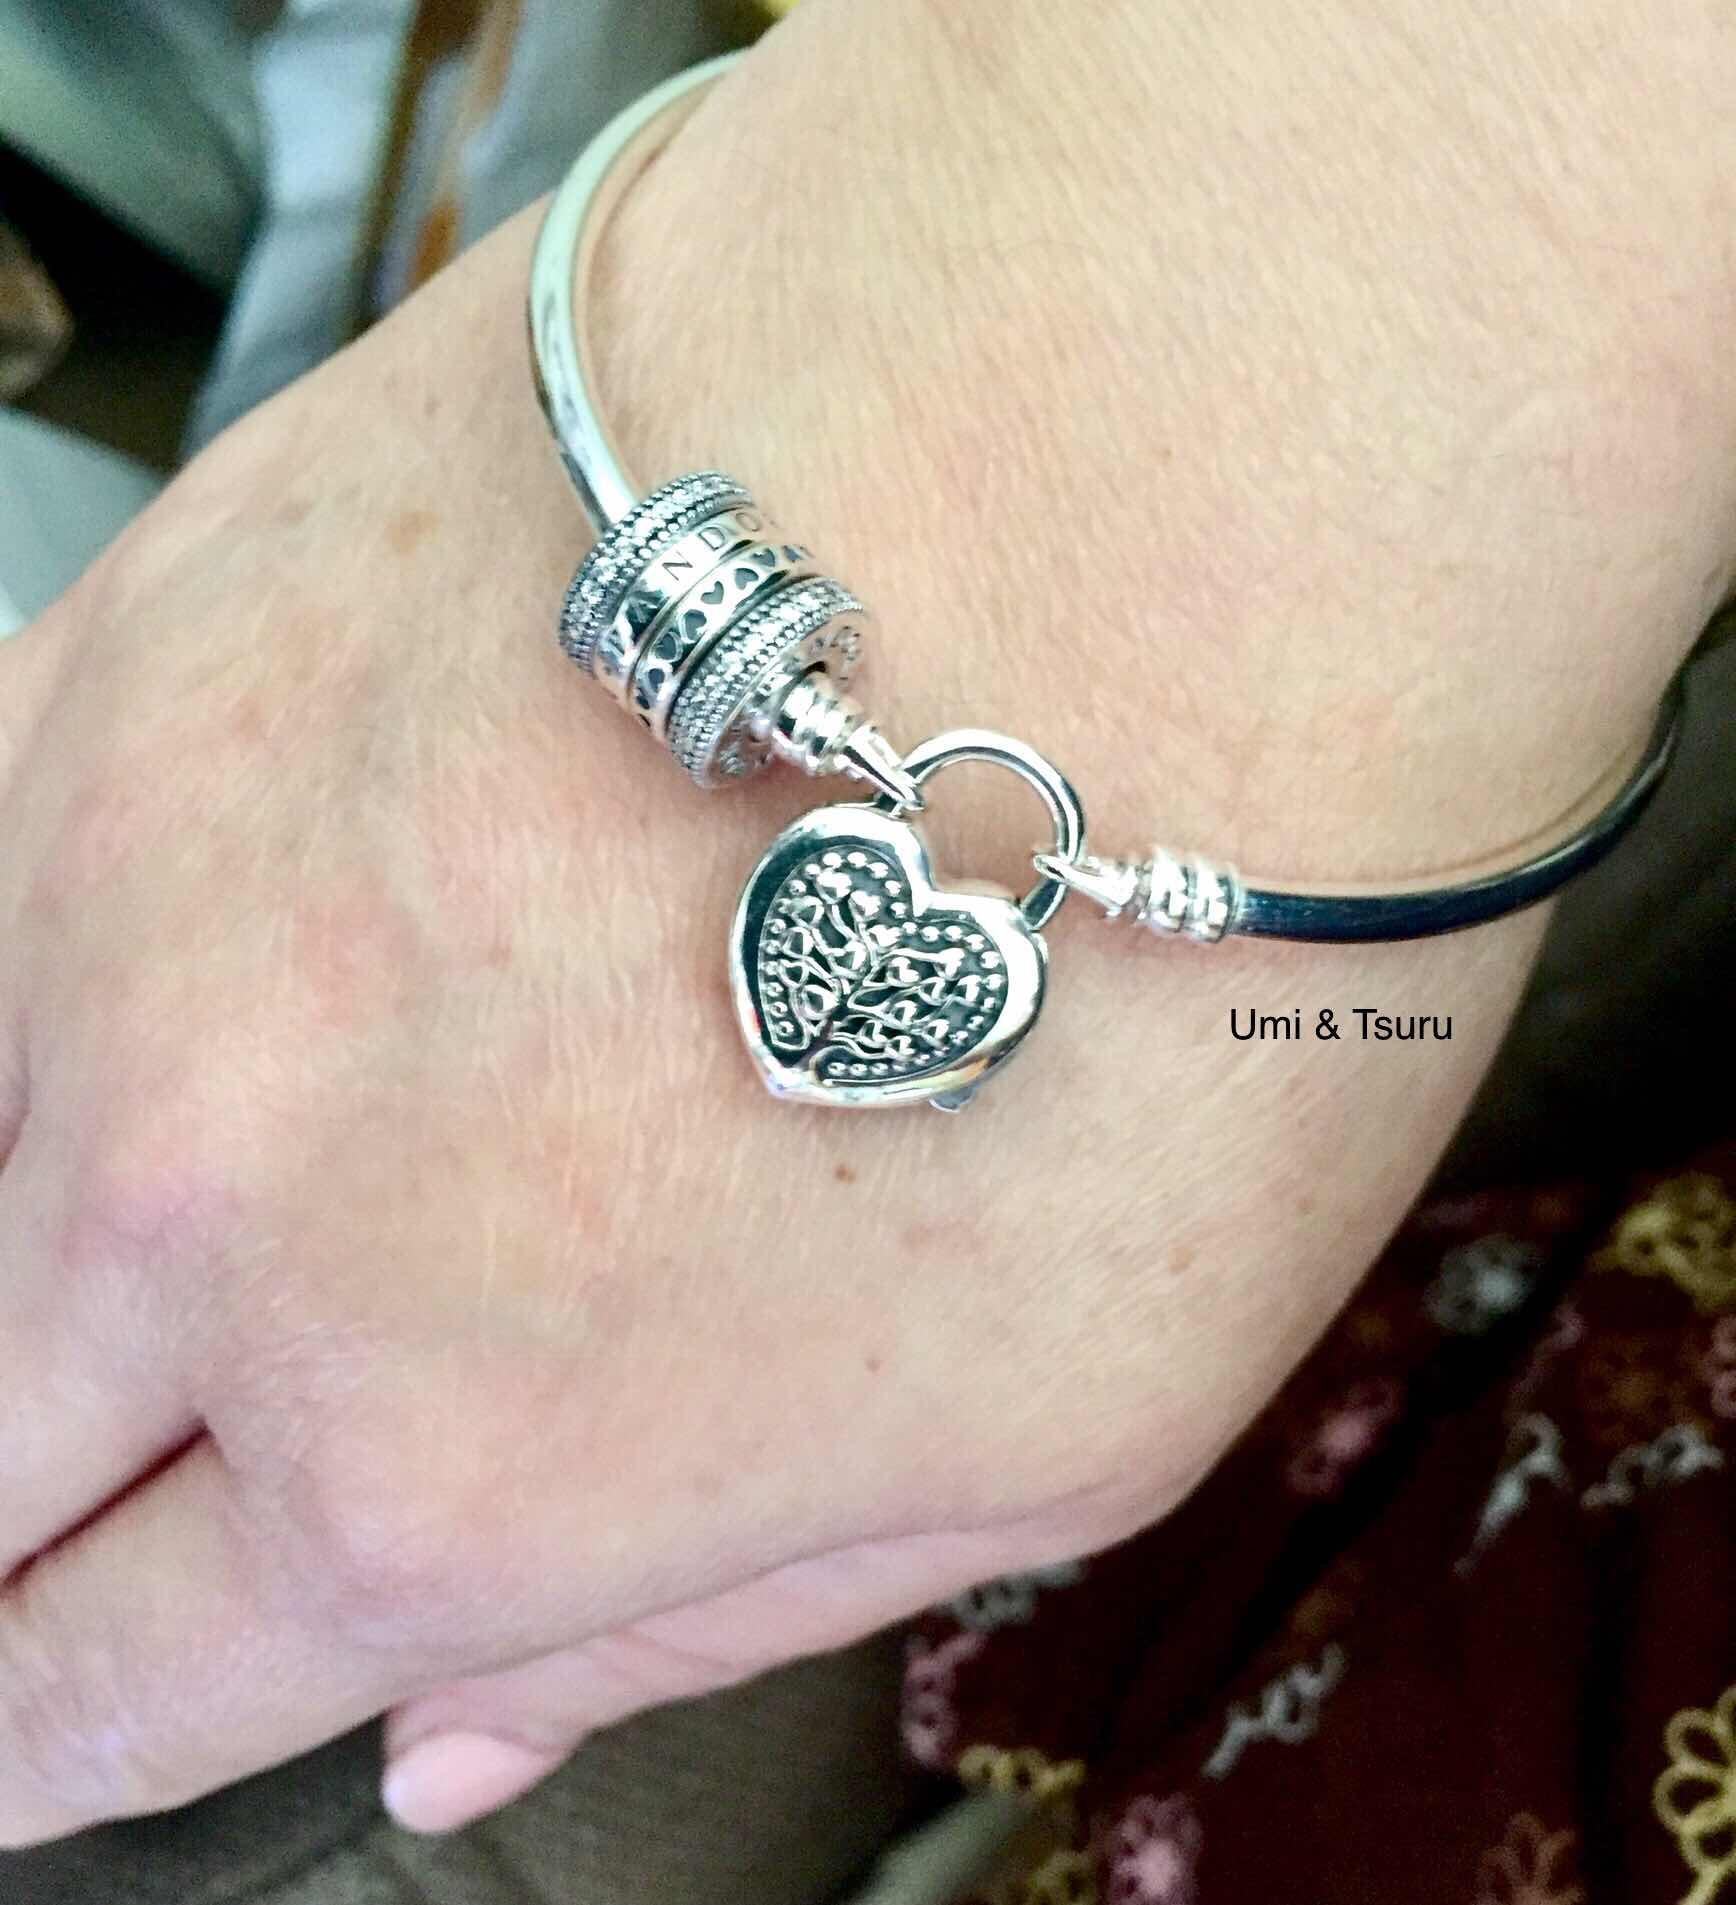 Umi Tsuru Pandora Bracelet Of The Week 8